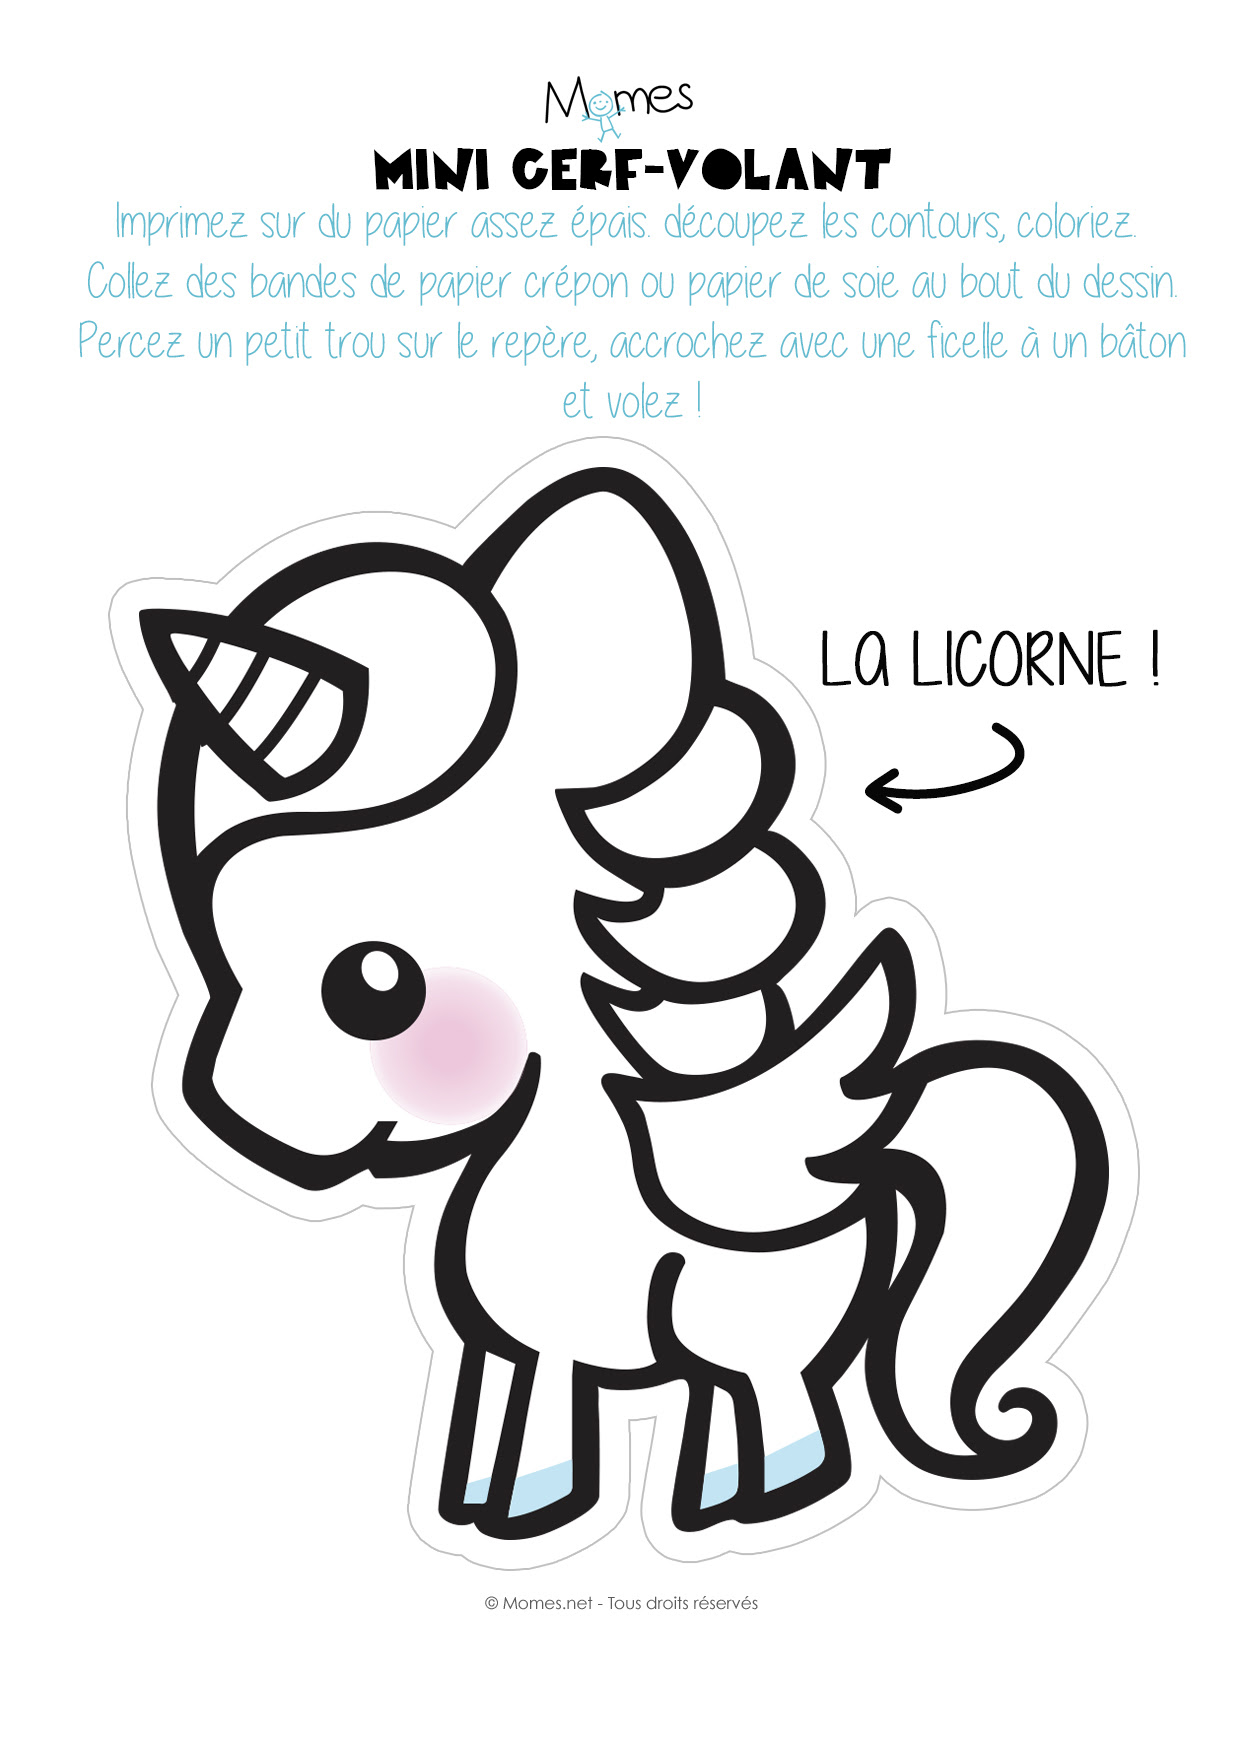 Mini Cerf Volant Licorne à Imprimer Momesnet